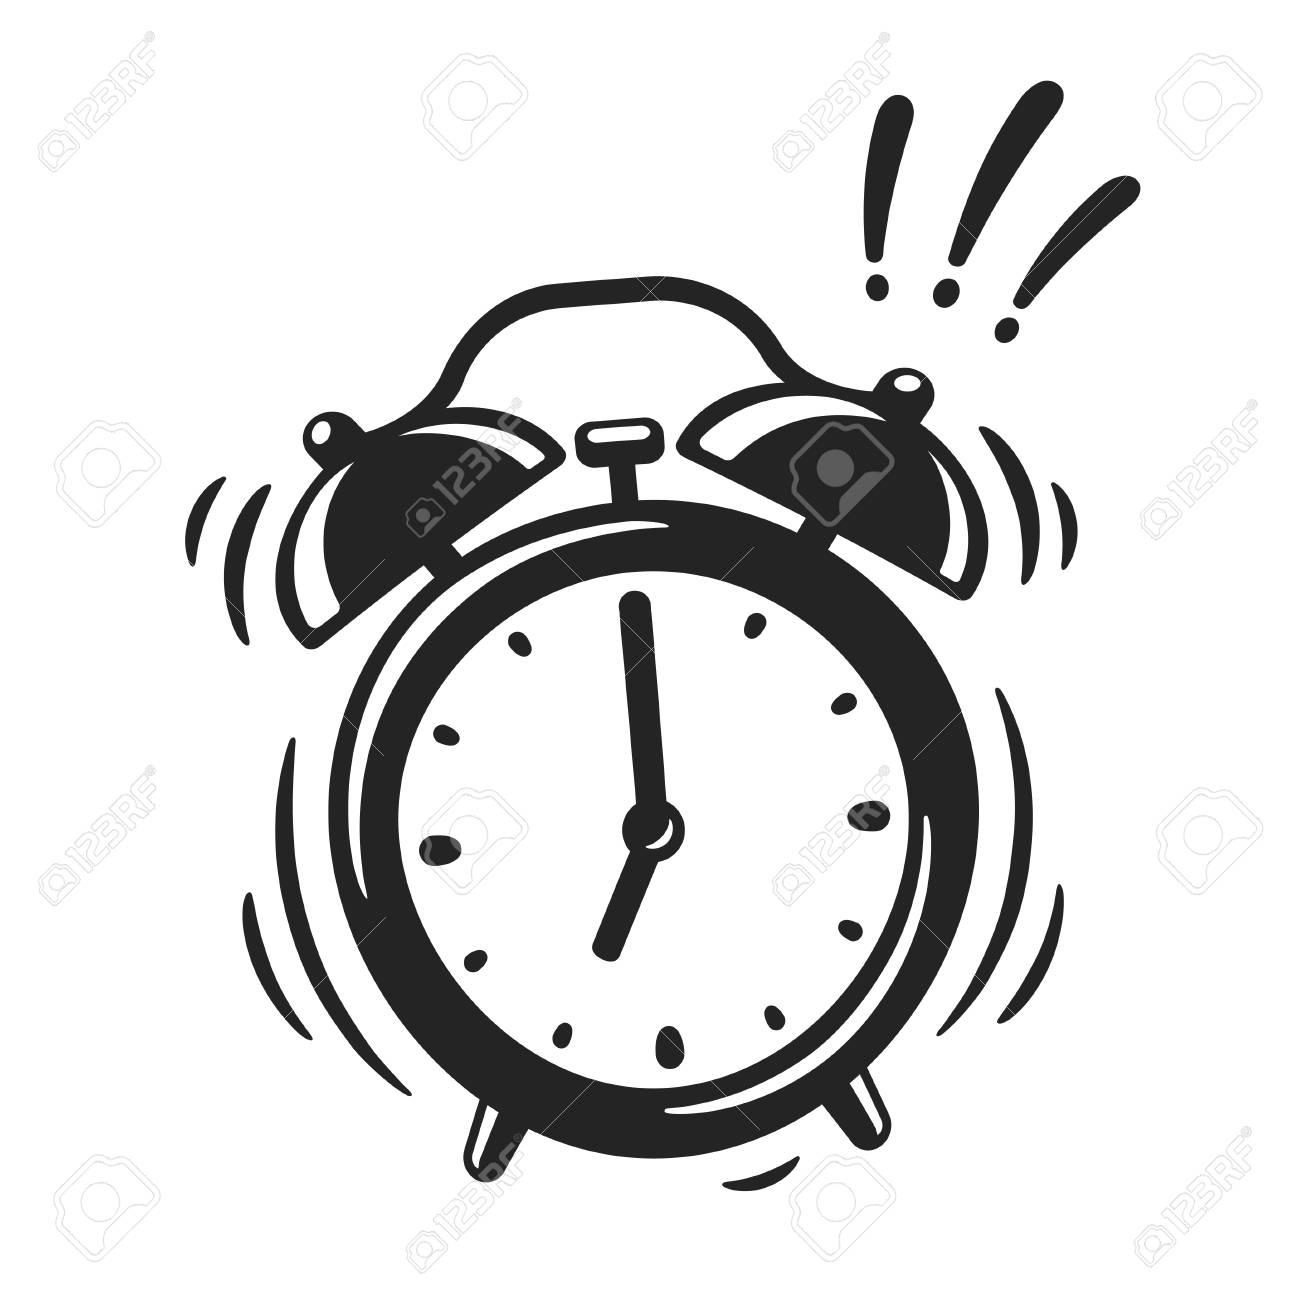 Hand drawn alarm clock ringing, black and white icon. Retro style...